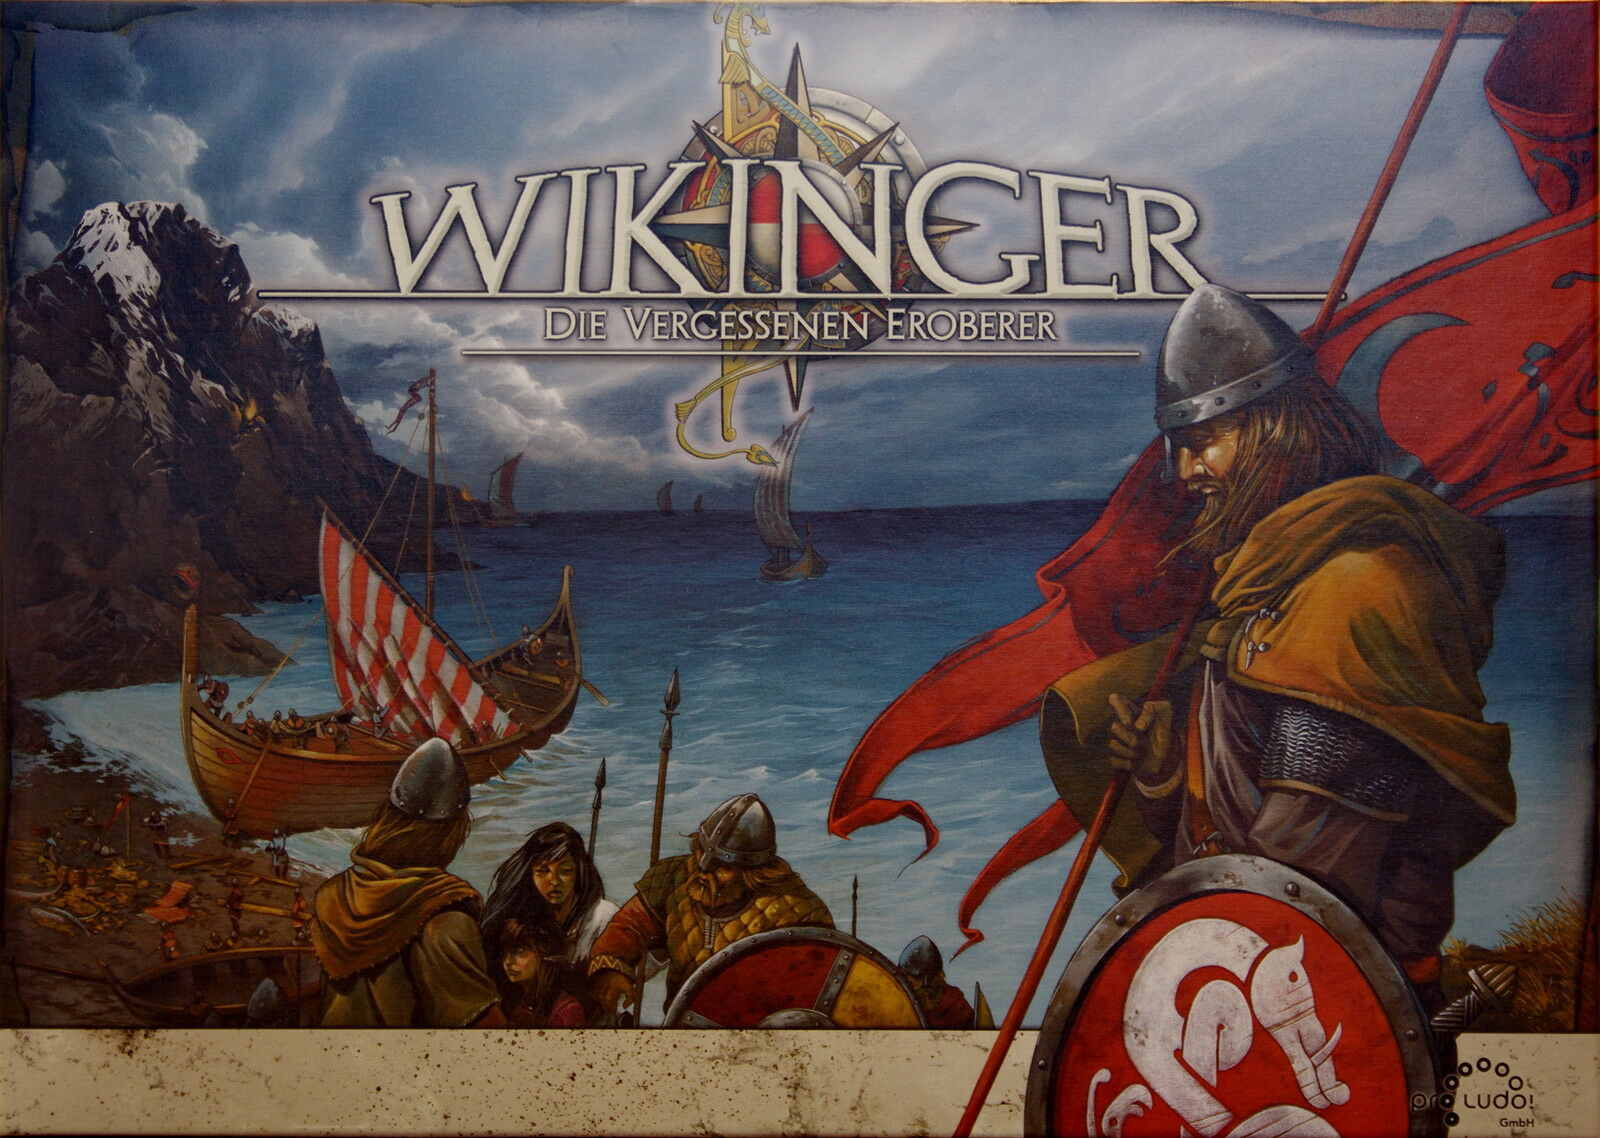 Jeu de société Wikinger - Die Vergessenen Eroberer - Pro Ludo - Jeu en allemand